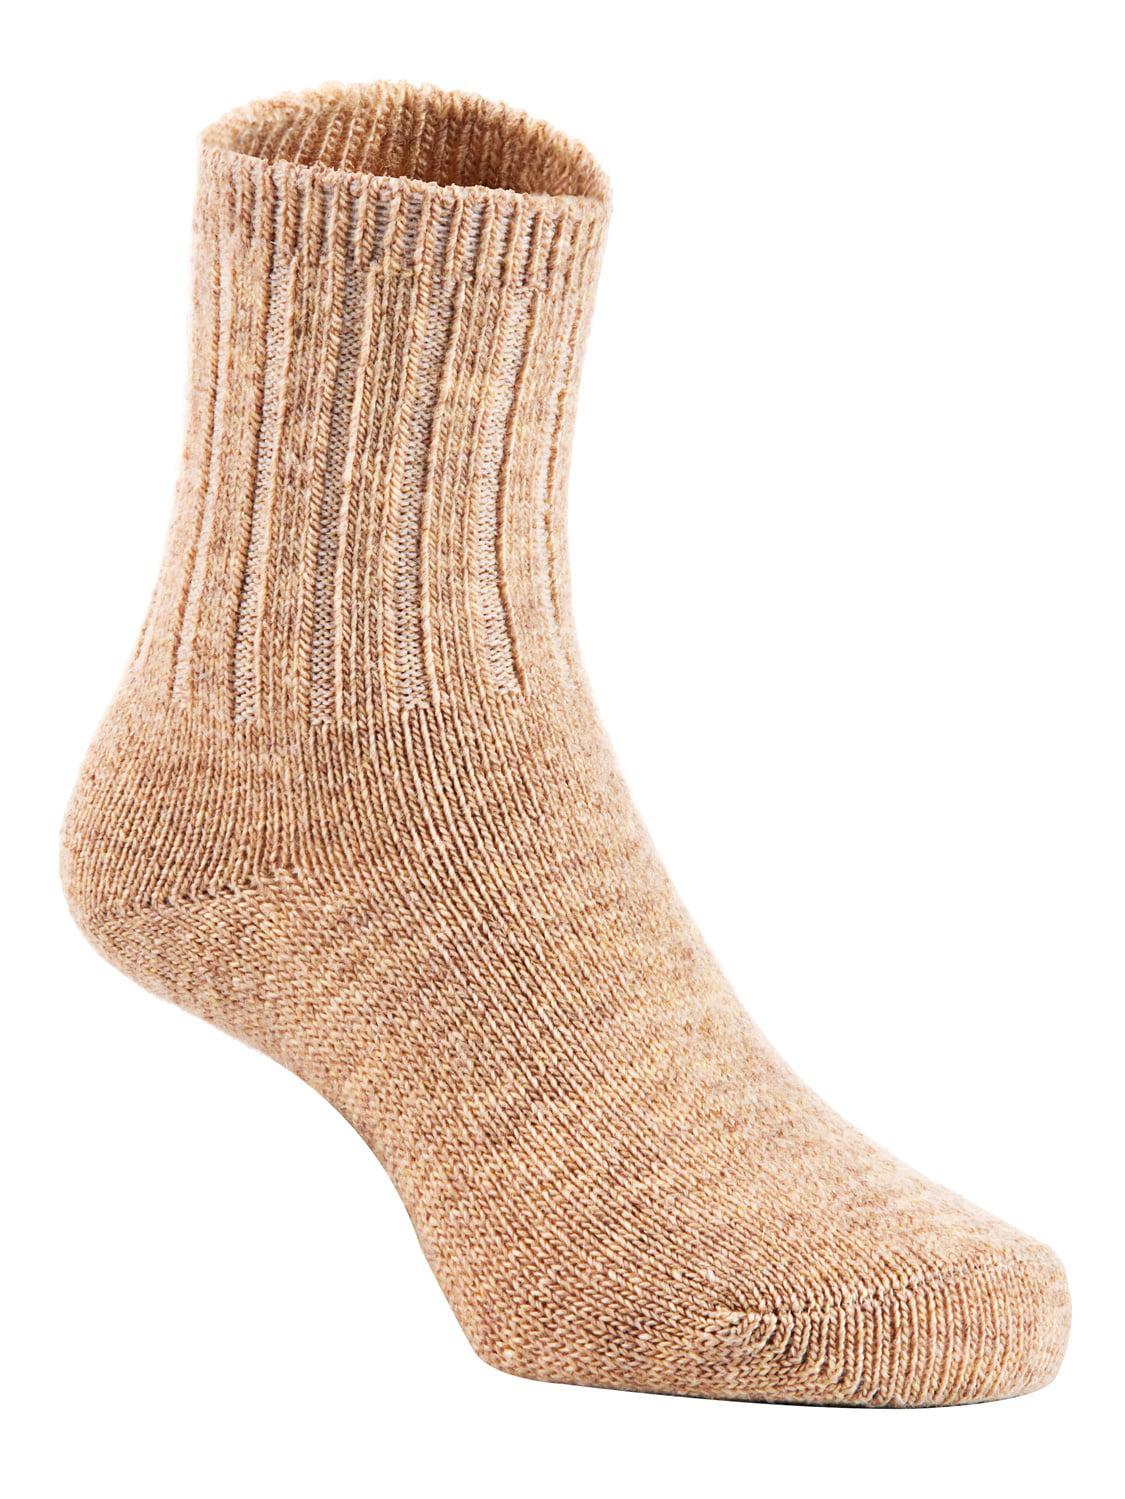 Lovely Annie Baby Toddler Children 4 Pairs Wool Tube Socks Solid 4Y-6Y(Random Boy Color)